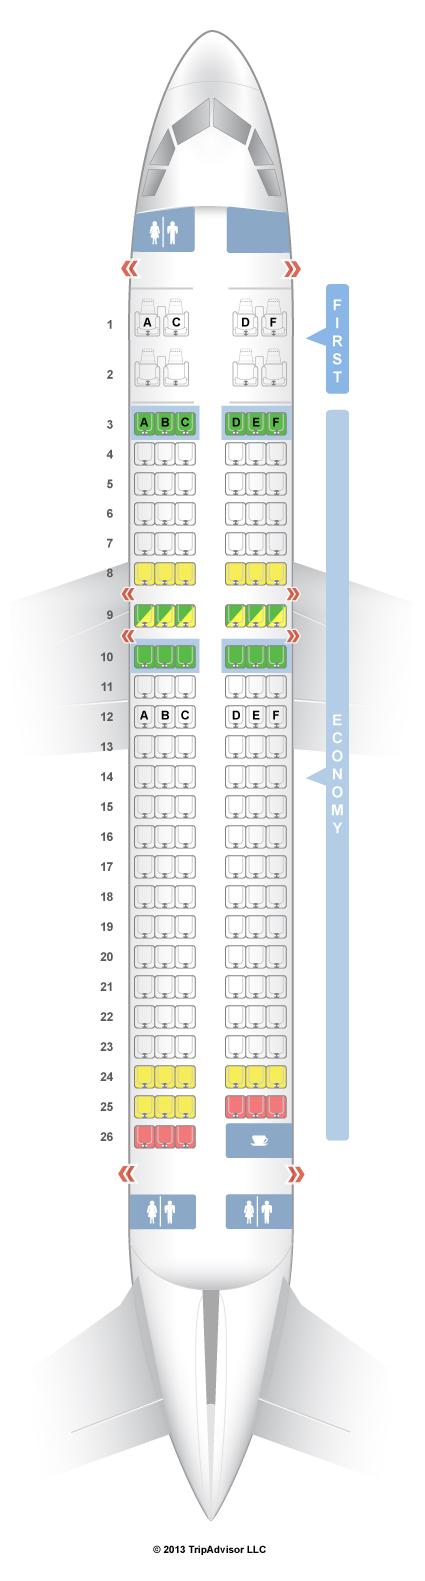 Virgin_America_Airbus_A320